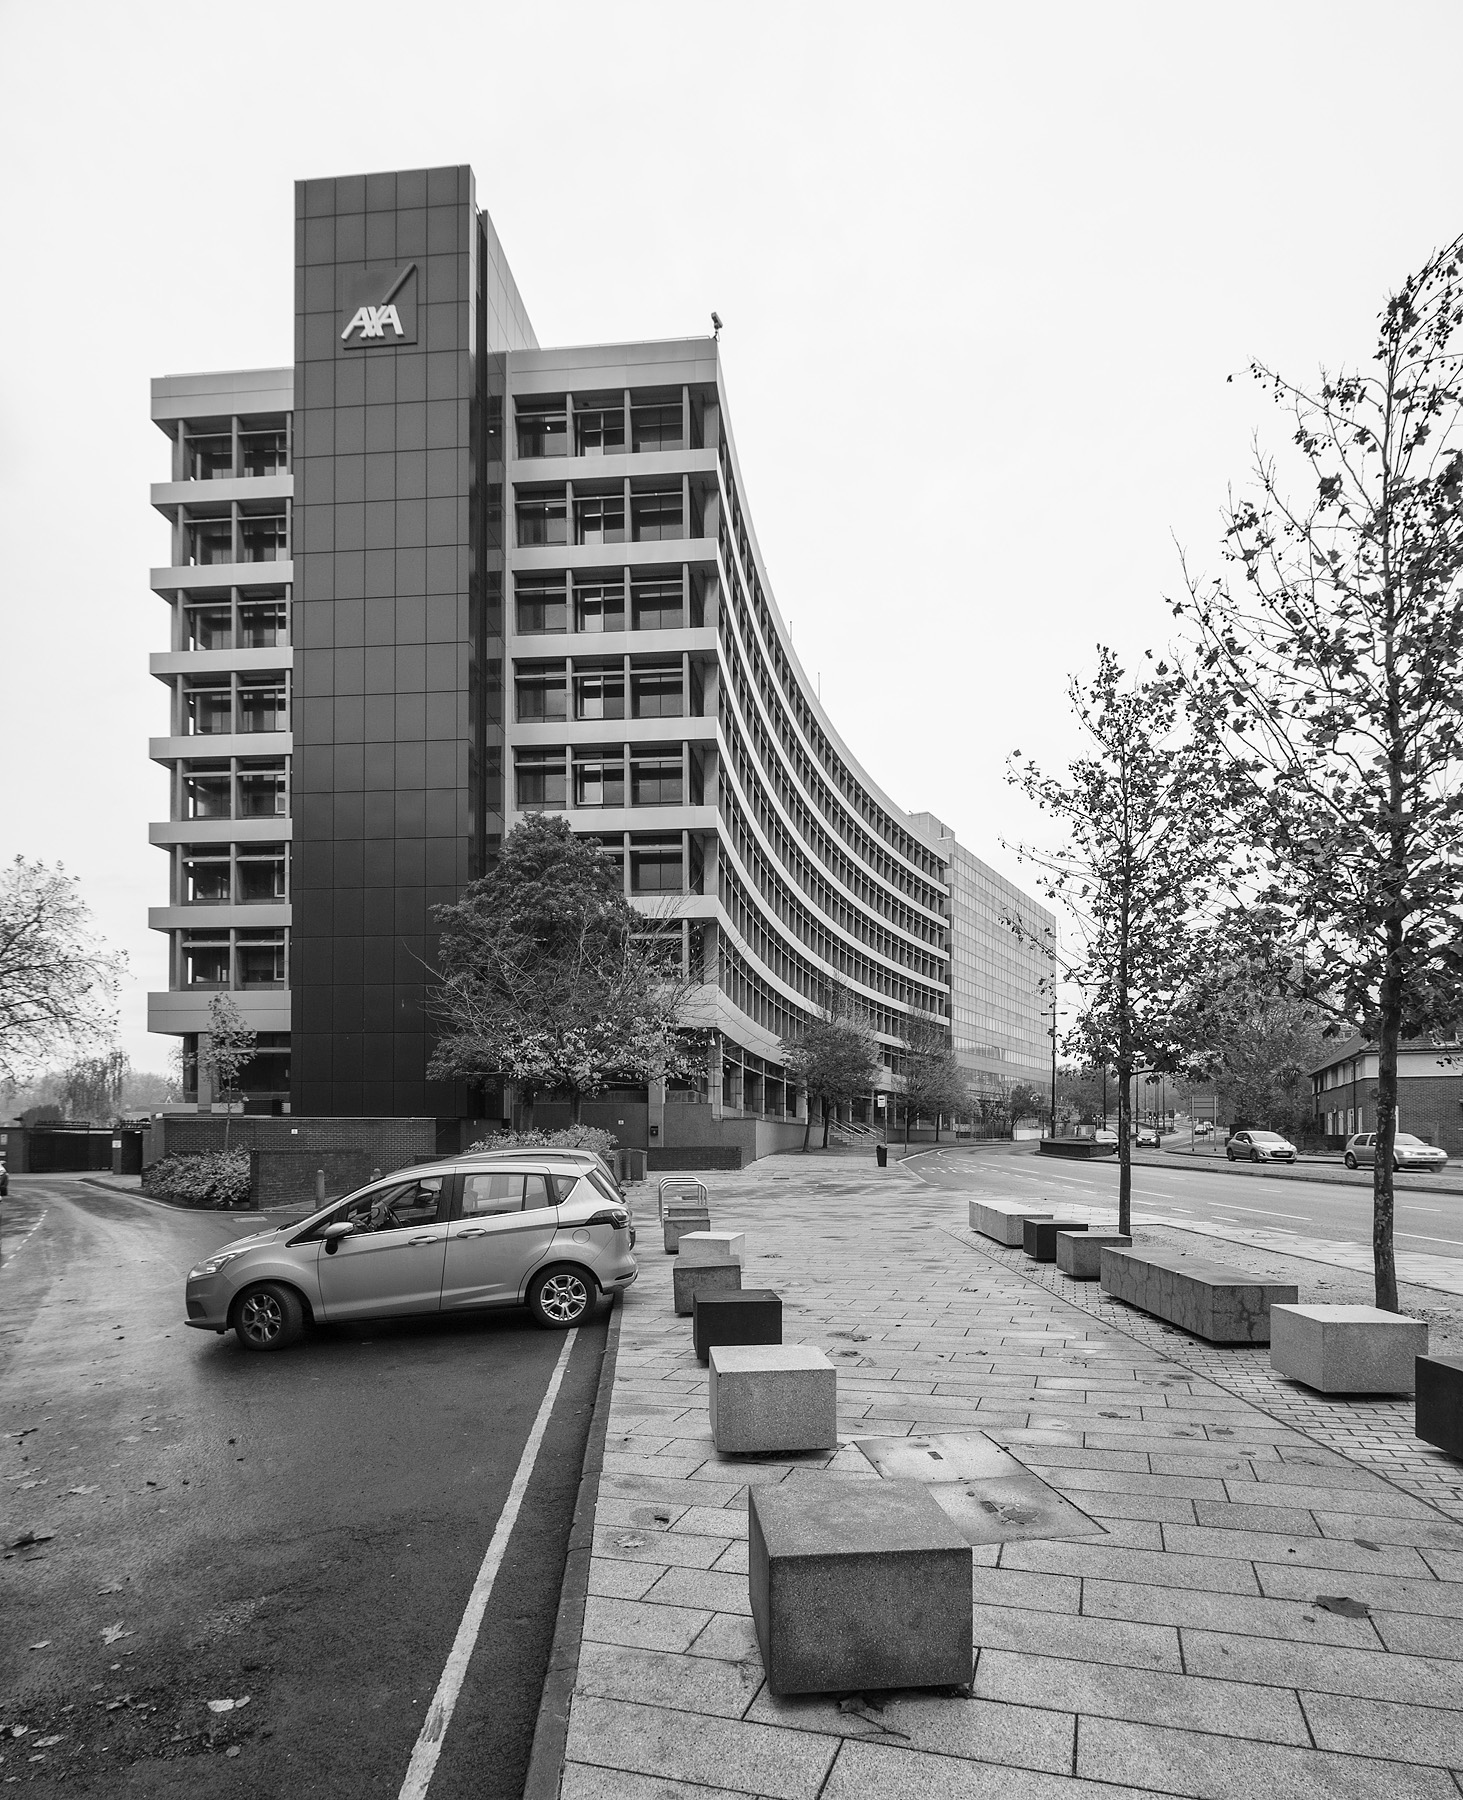 Axa building, looking along civic drive, Ipswich, Suffolk